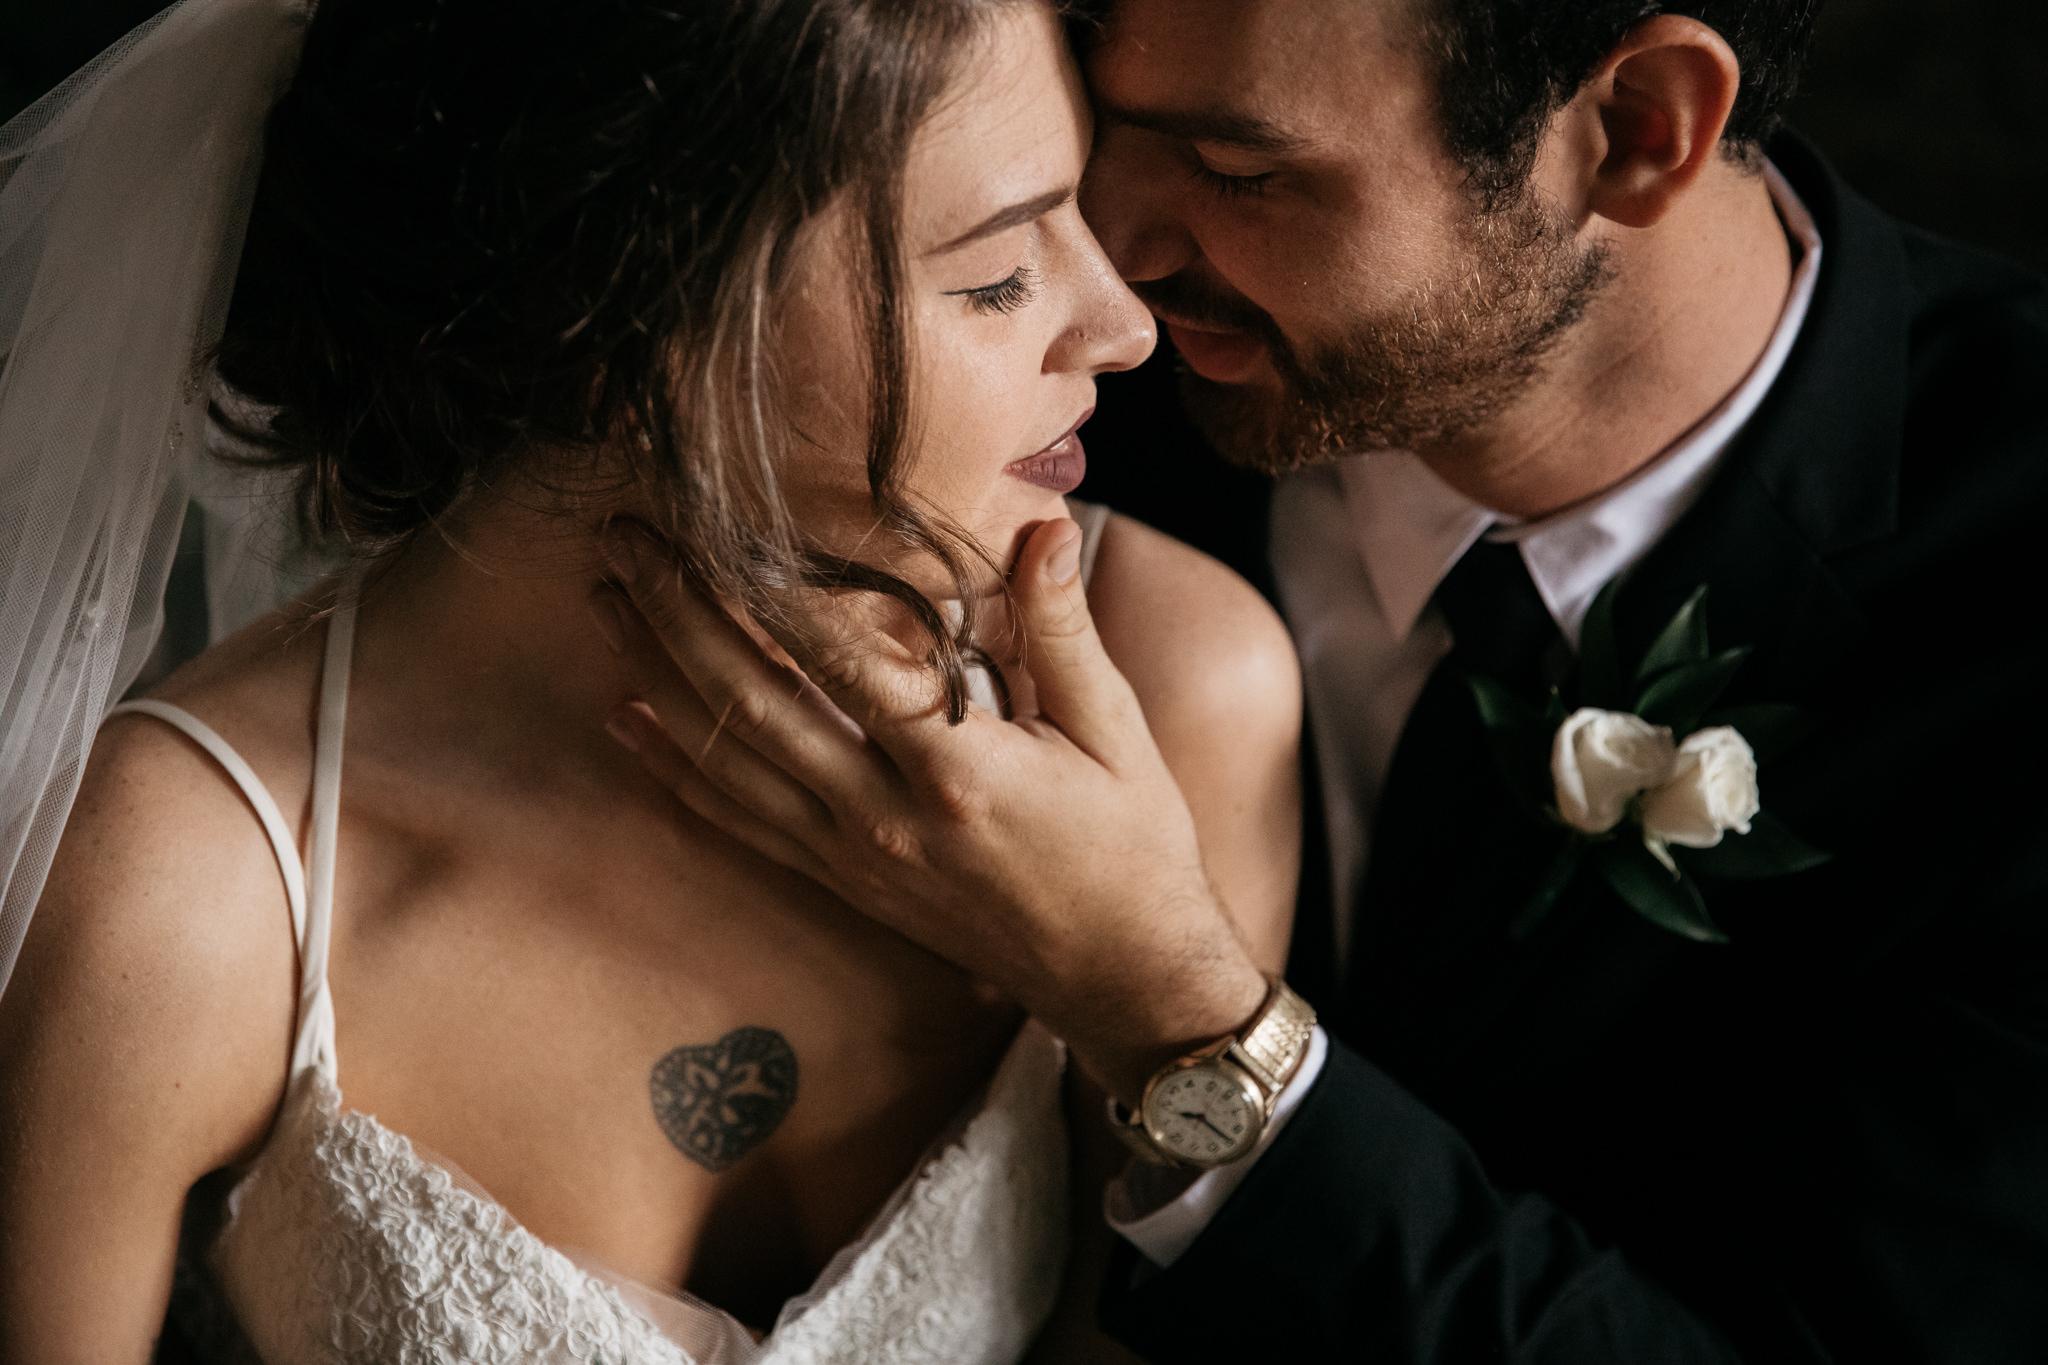 phantom-canyon-brewery-colorado-springs-wedding-photographer-287.jpg